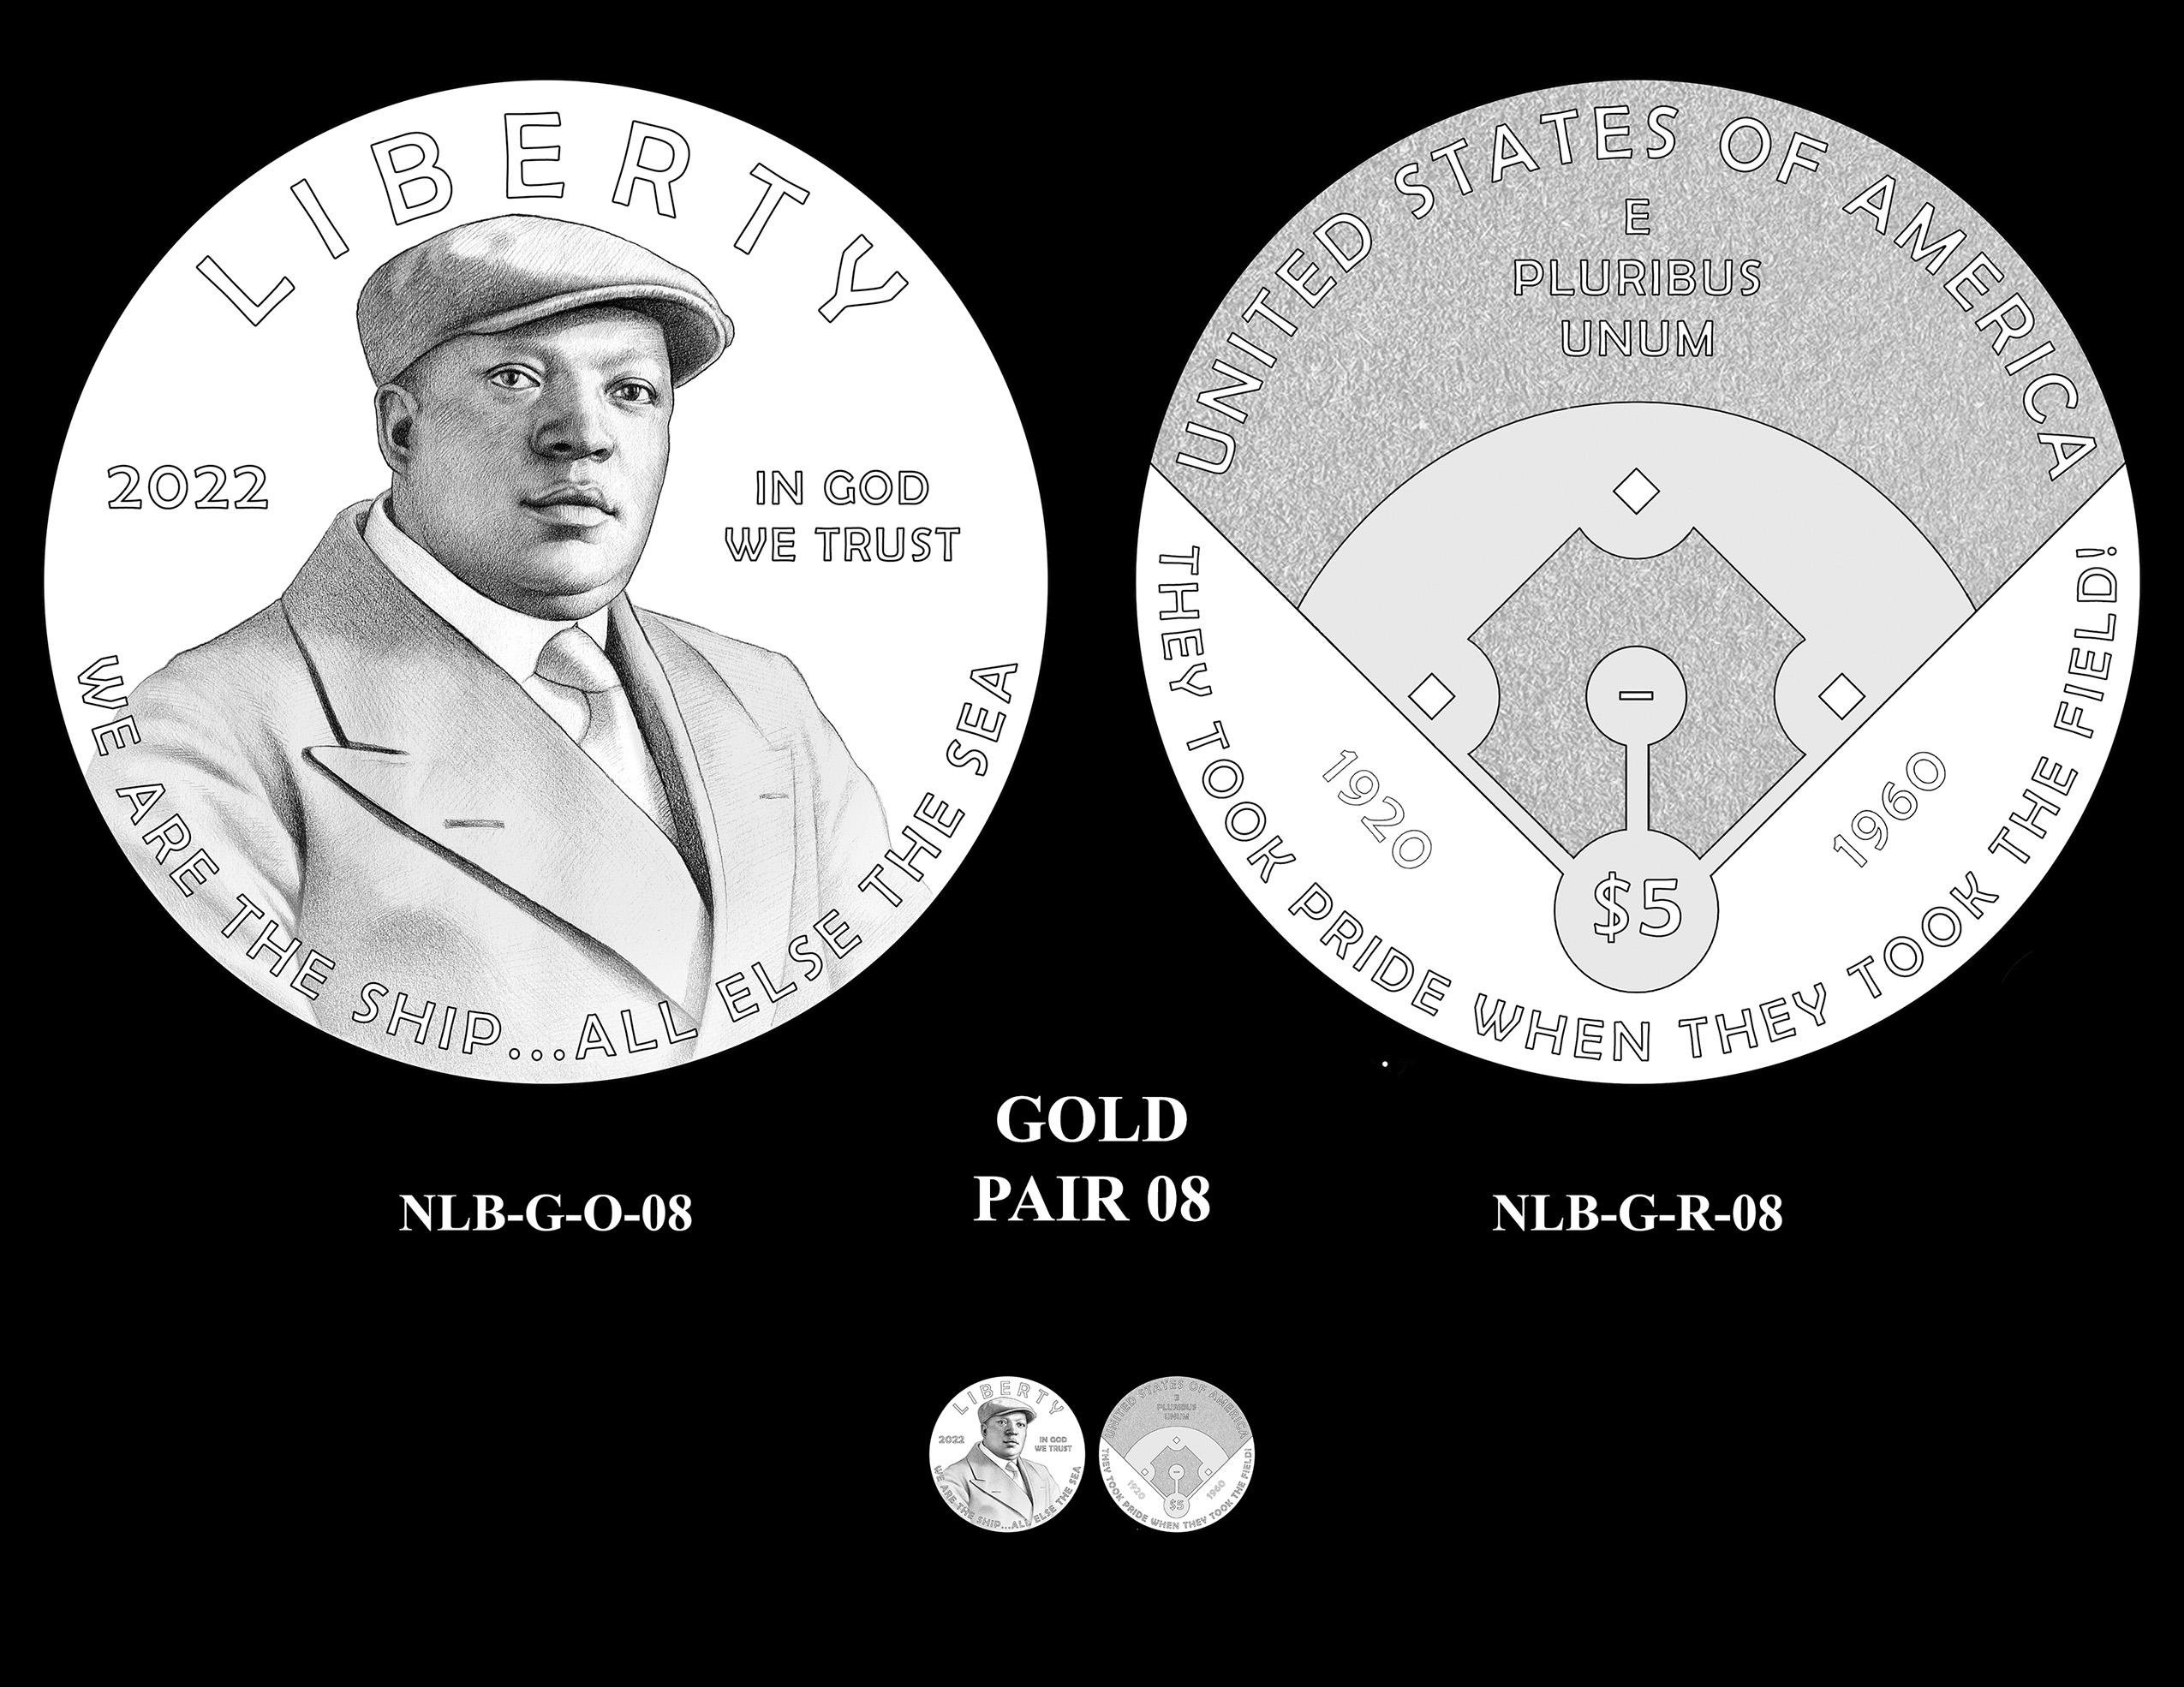 Gold Pair 08 -- Negro Leagues Baseball Commemorative Coin Program